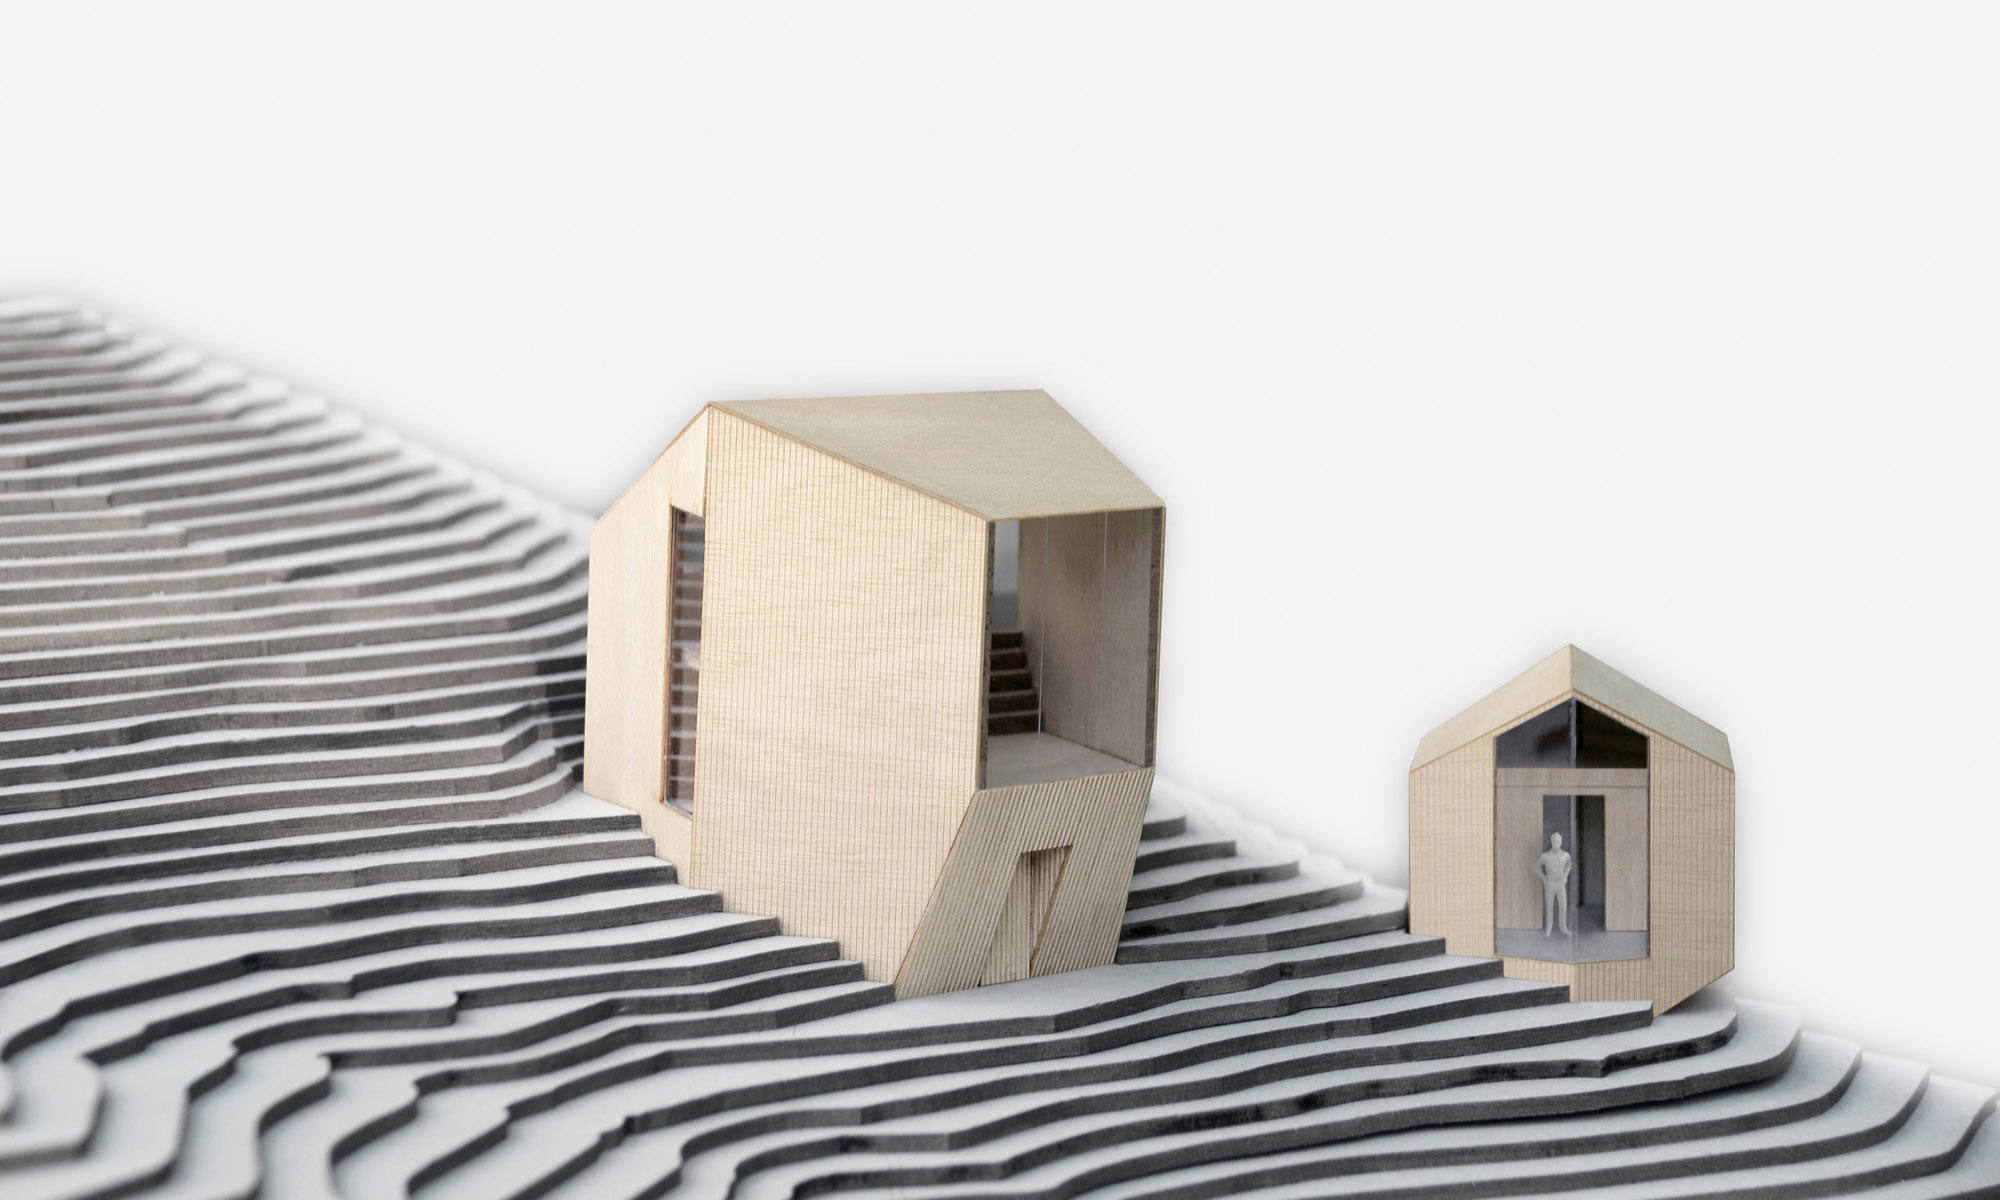 reiulf-ramstad-architects-4